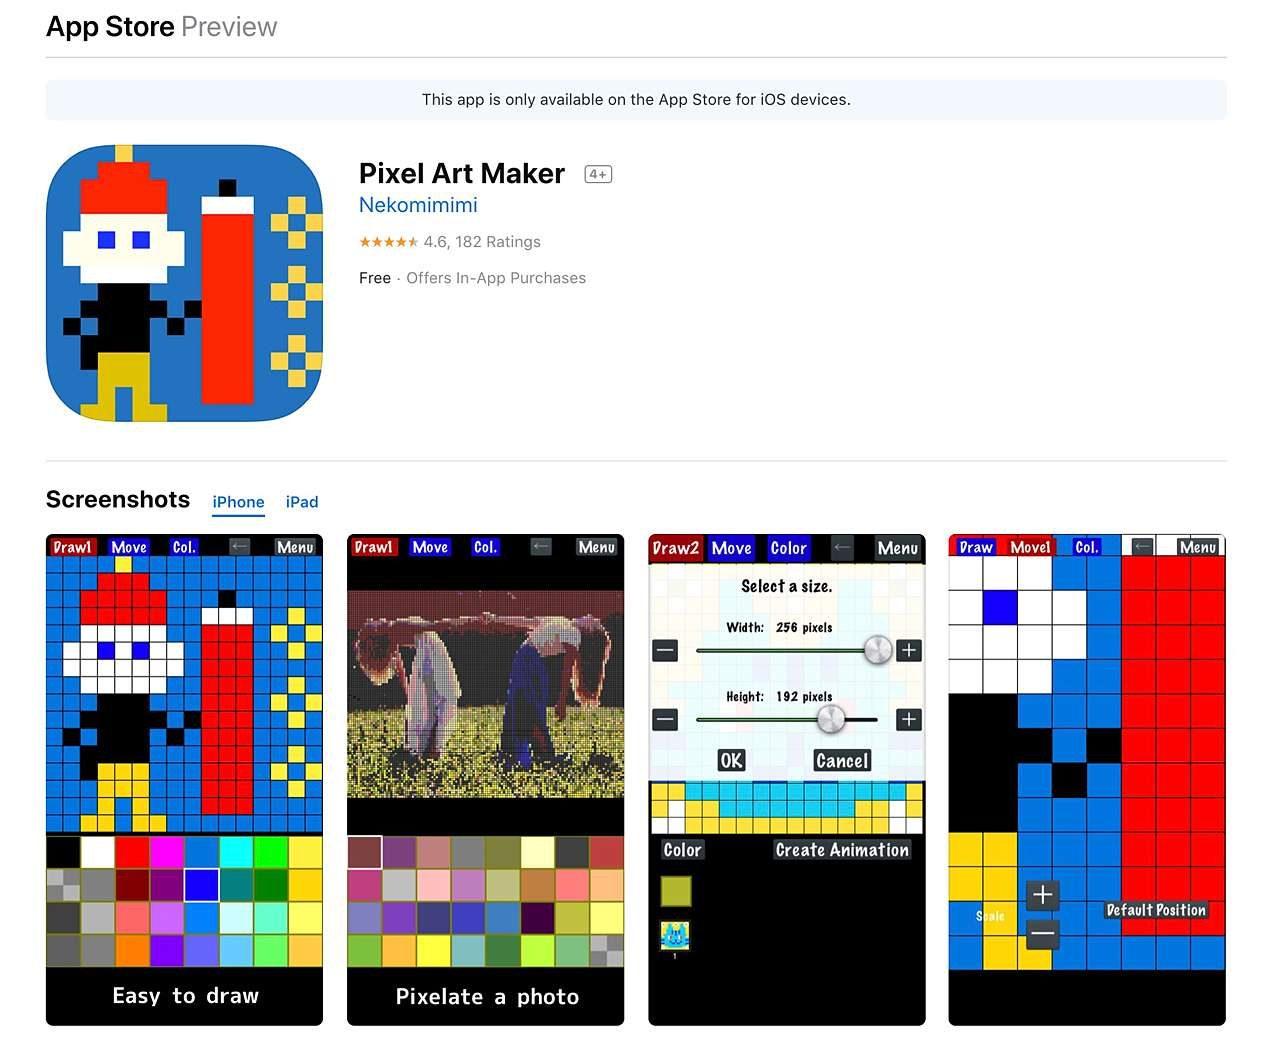 Pixel Art Maker app